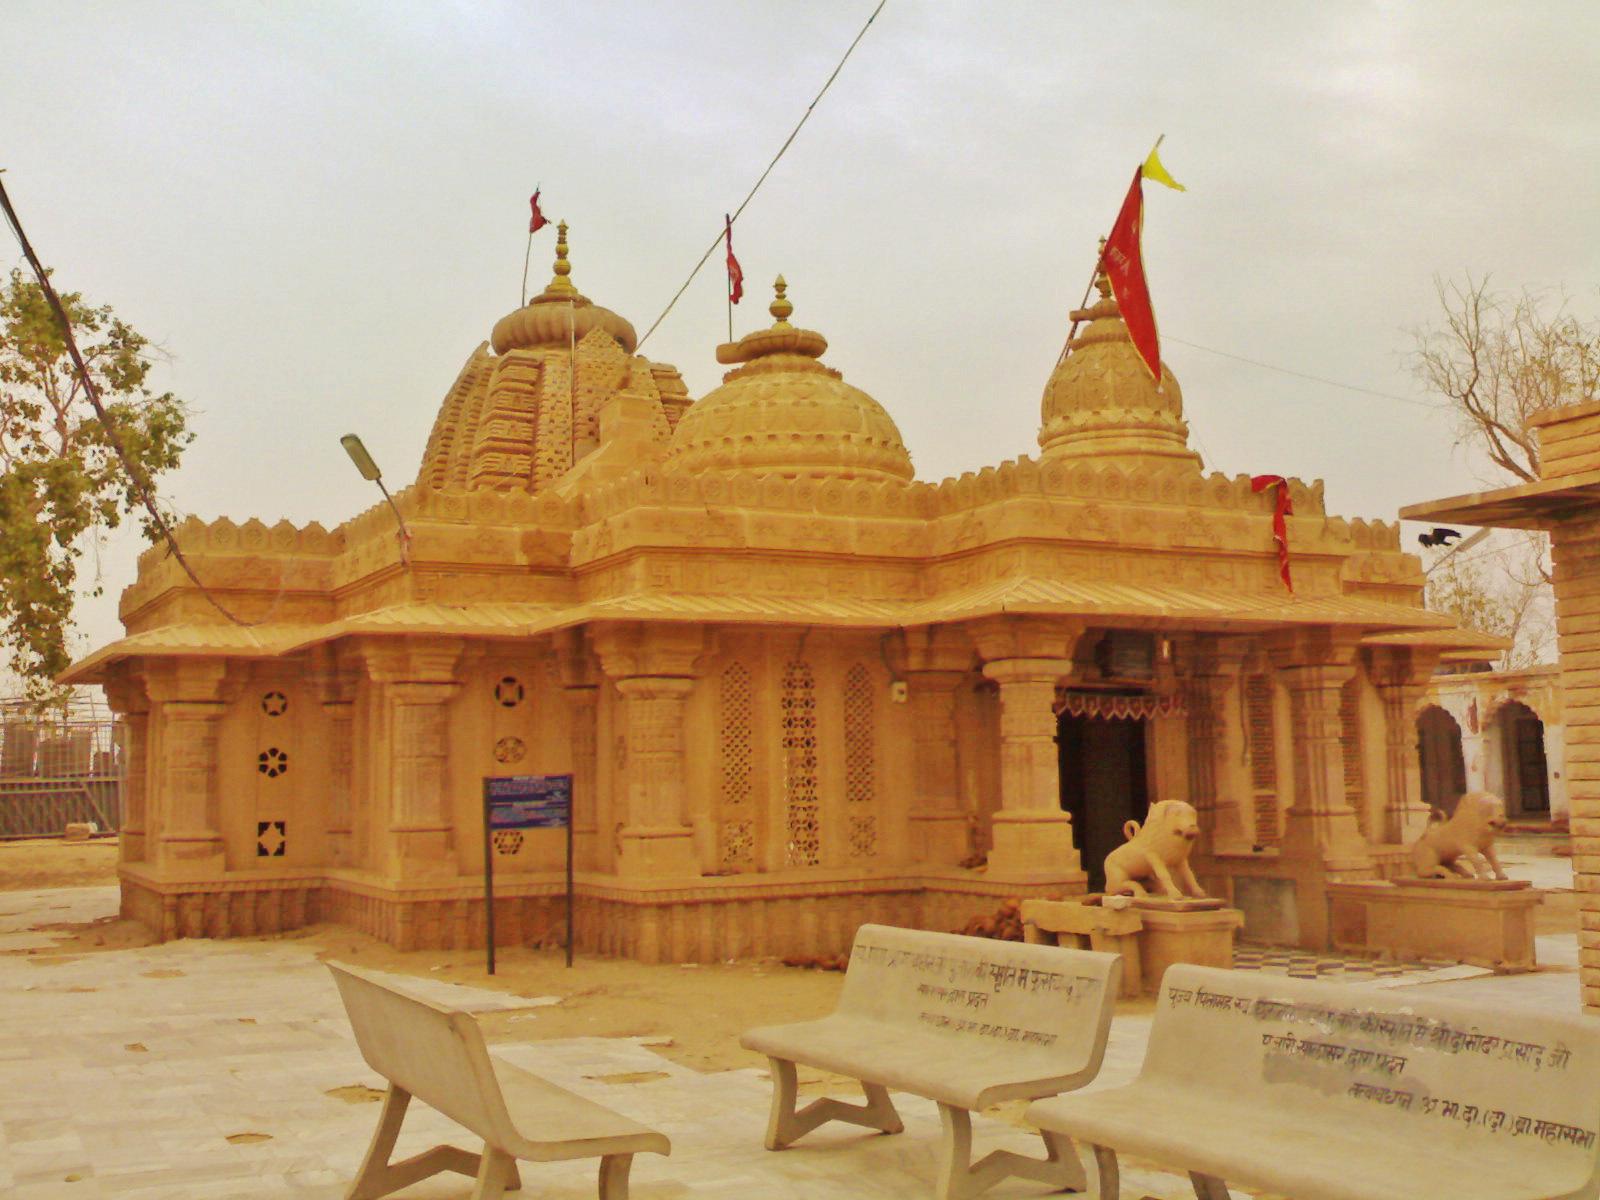 File:Dadhimati Mata Temple, Rajasthan.jpg - Wikimedia Commons